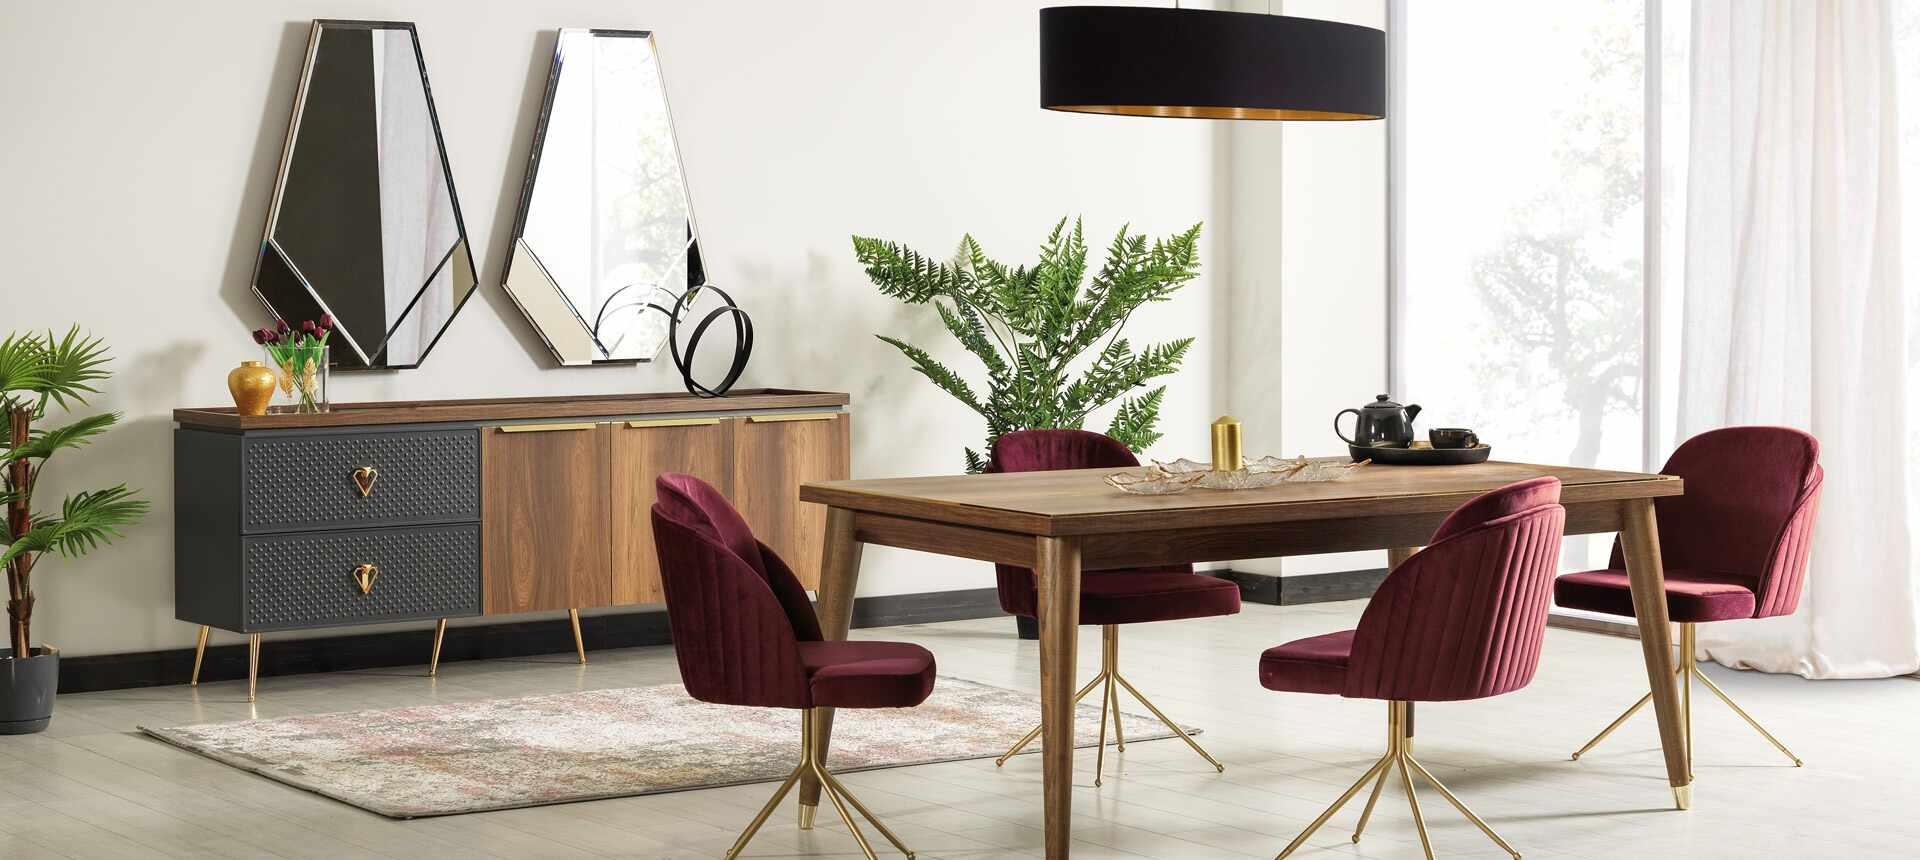 Set de mobila dining din pal si metal, 10 piese Pietro Nuc la pret 11180 lei